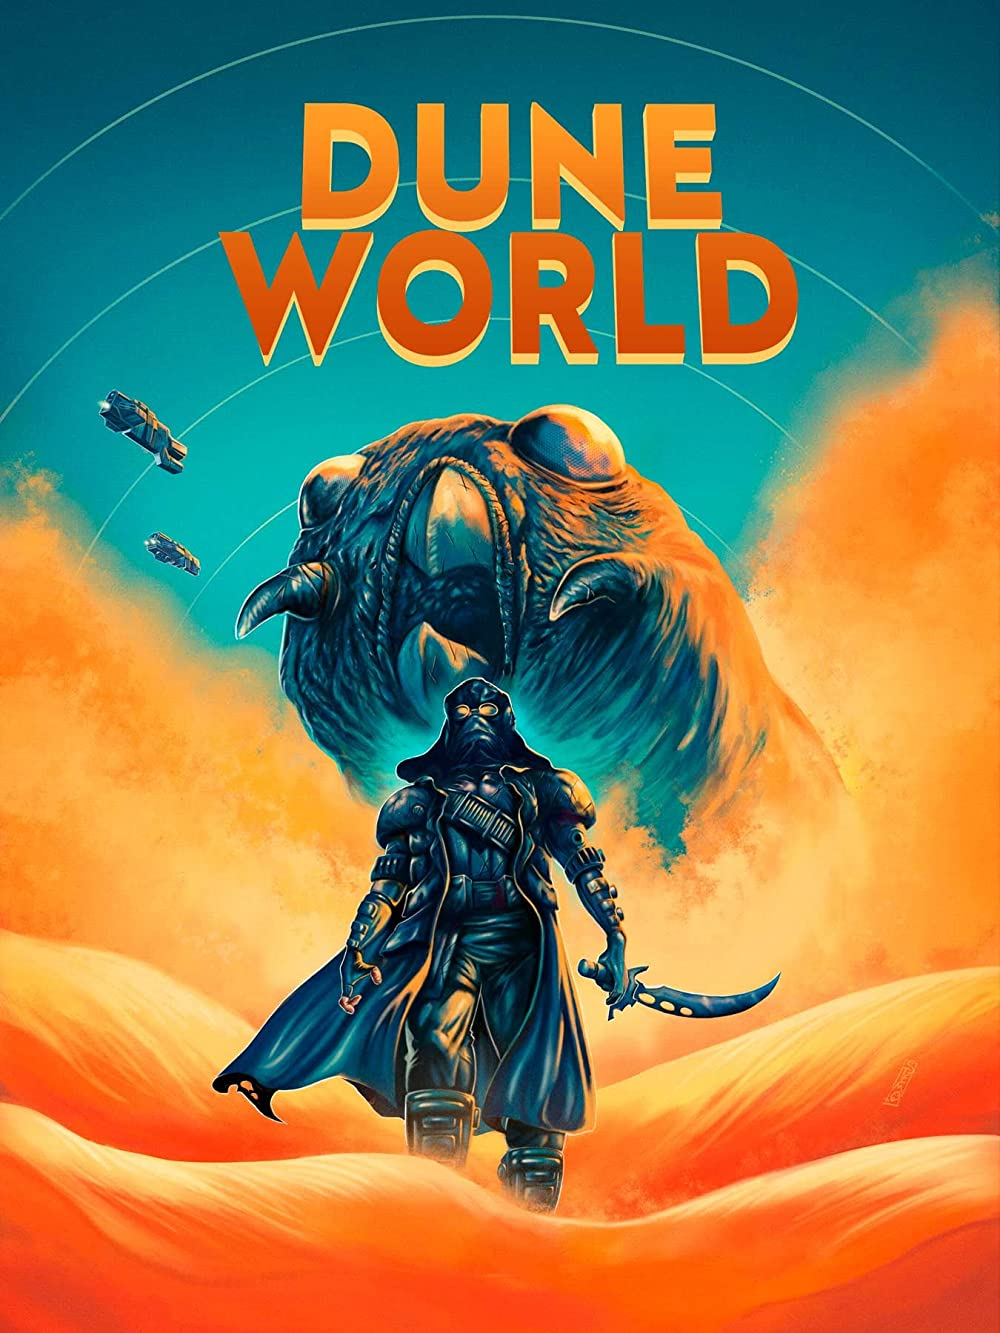 Dune World (2021) Full Movie [In English] With Hindi Subtitles | WebRip 720p [1XBET]